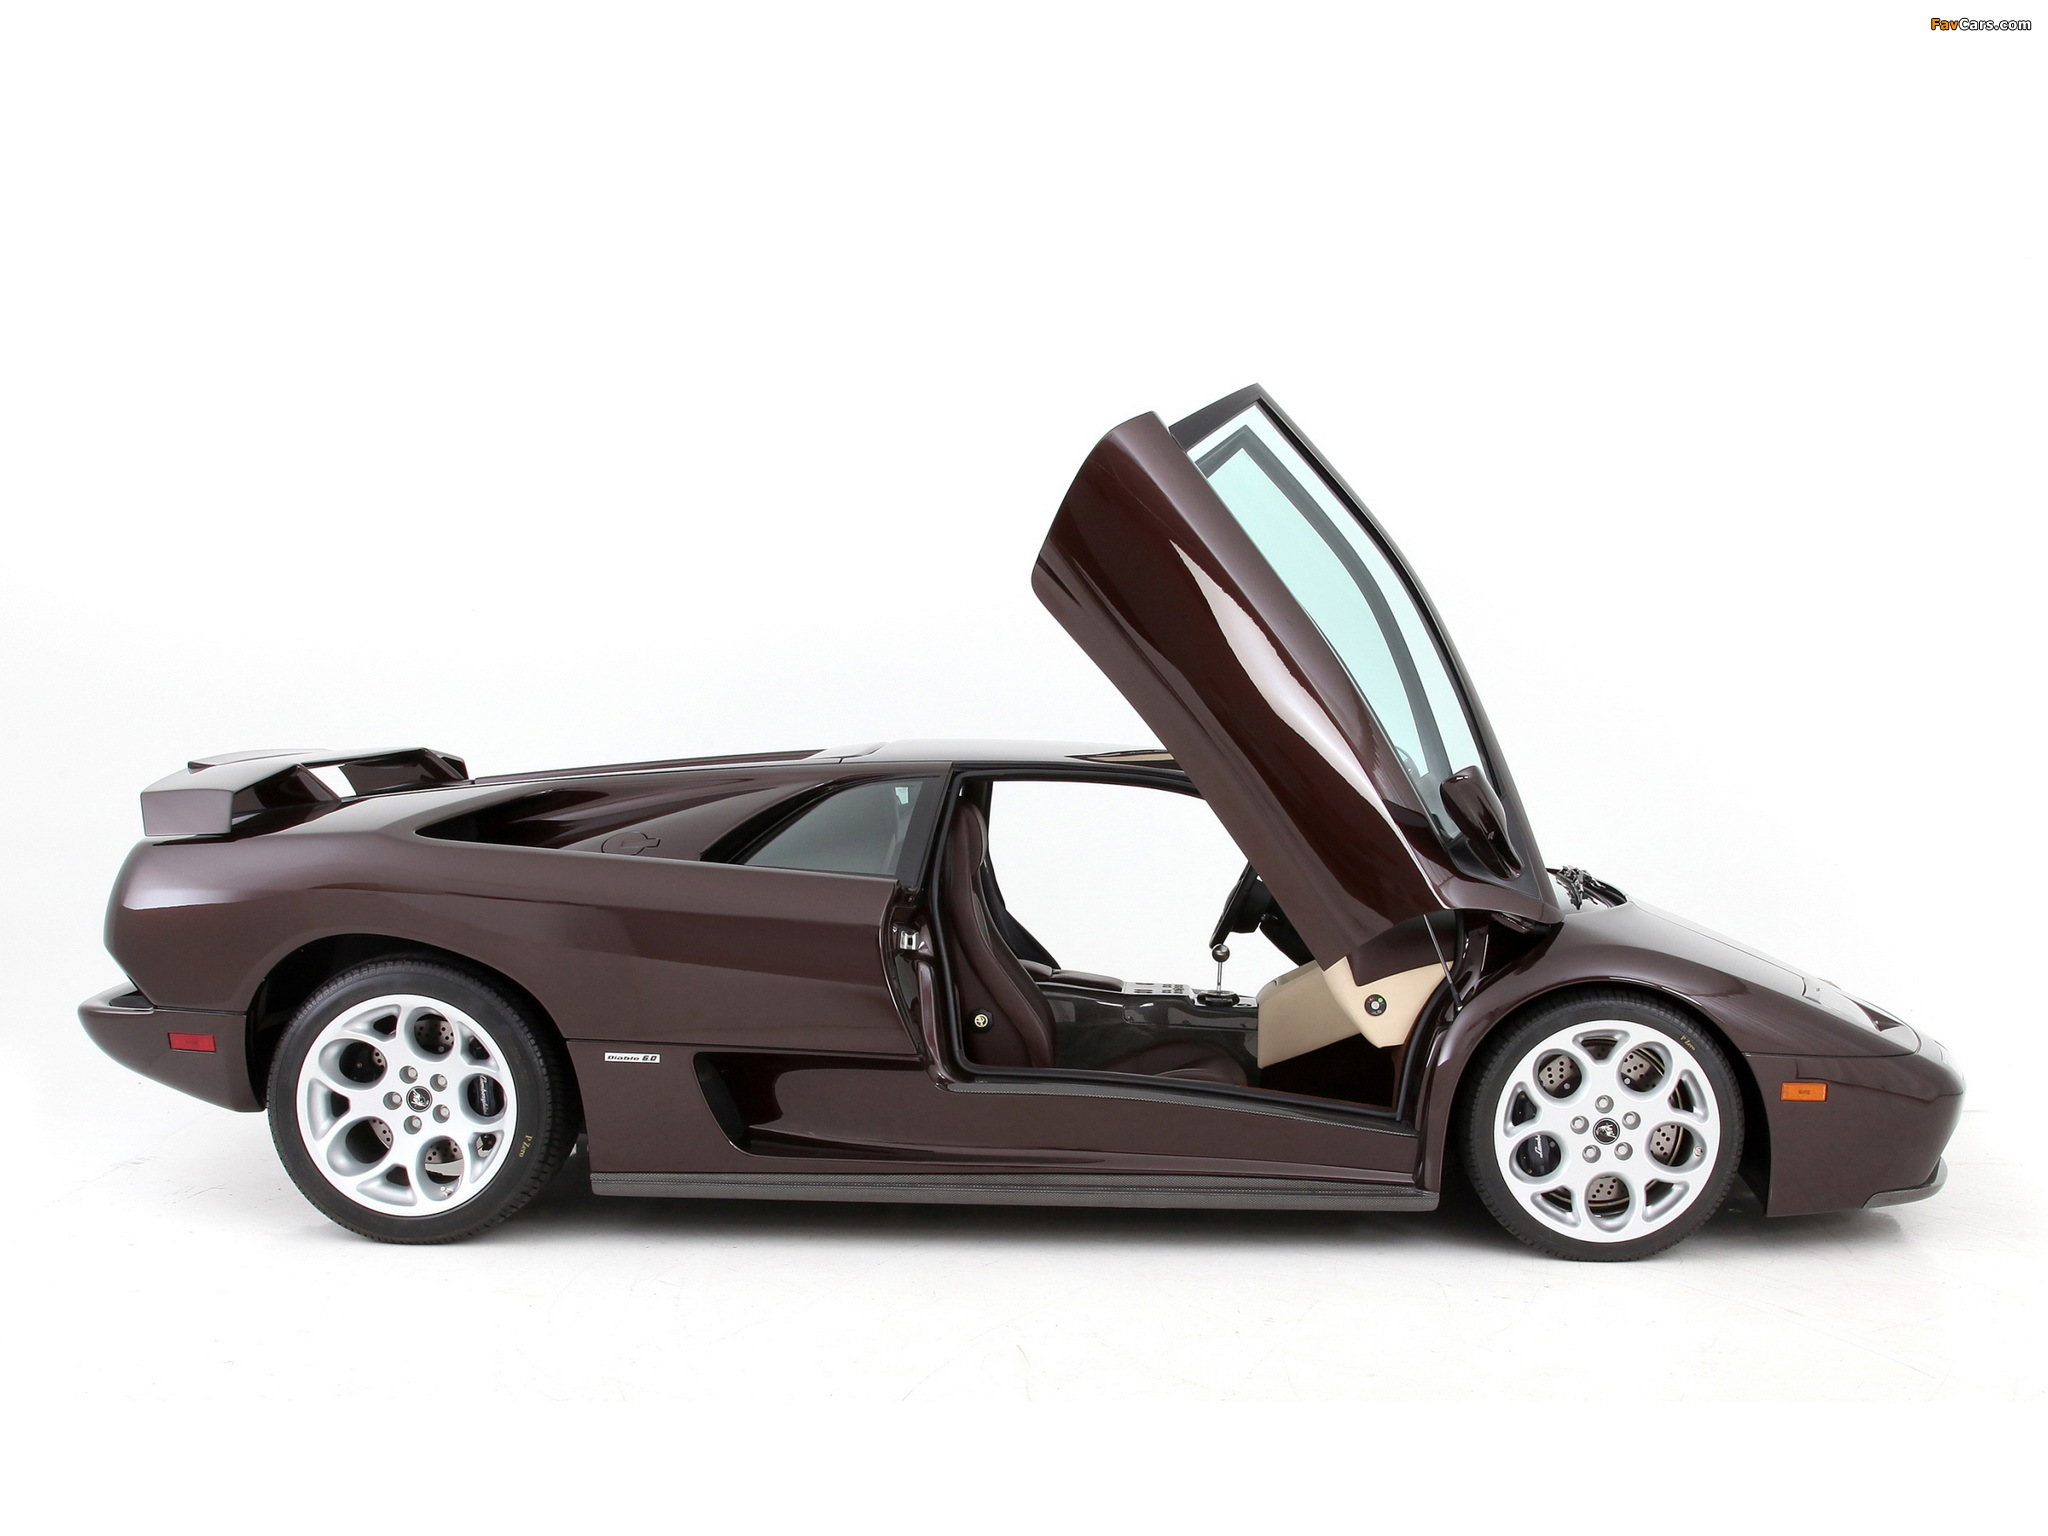 Lamborghini Diablo VT 6.0 SE 2001 photos (2048 x 1536)